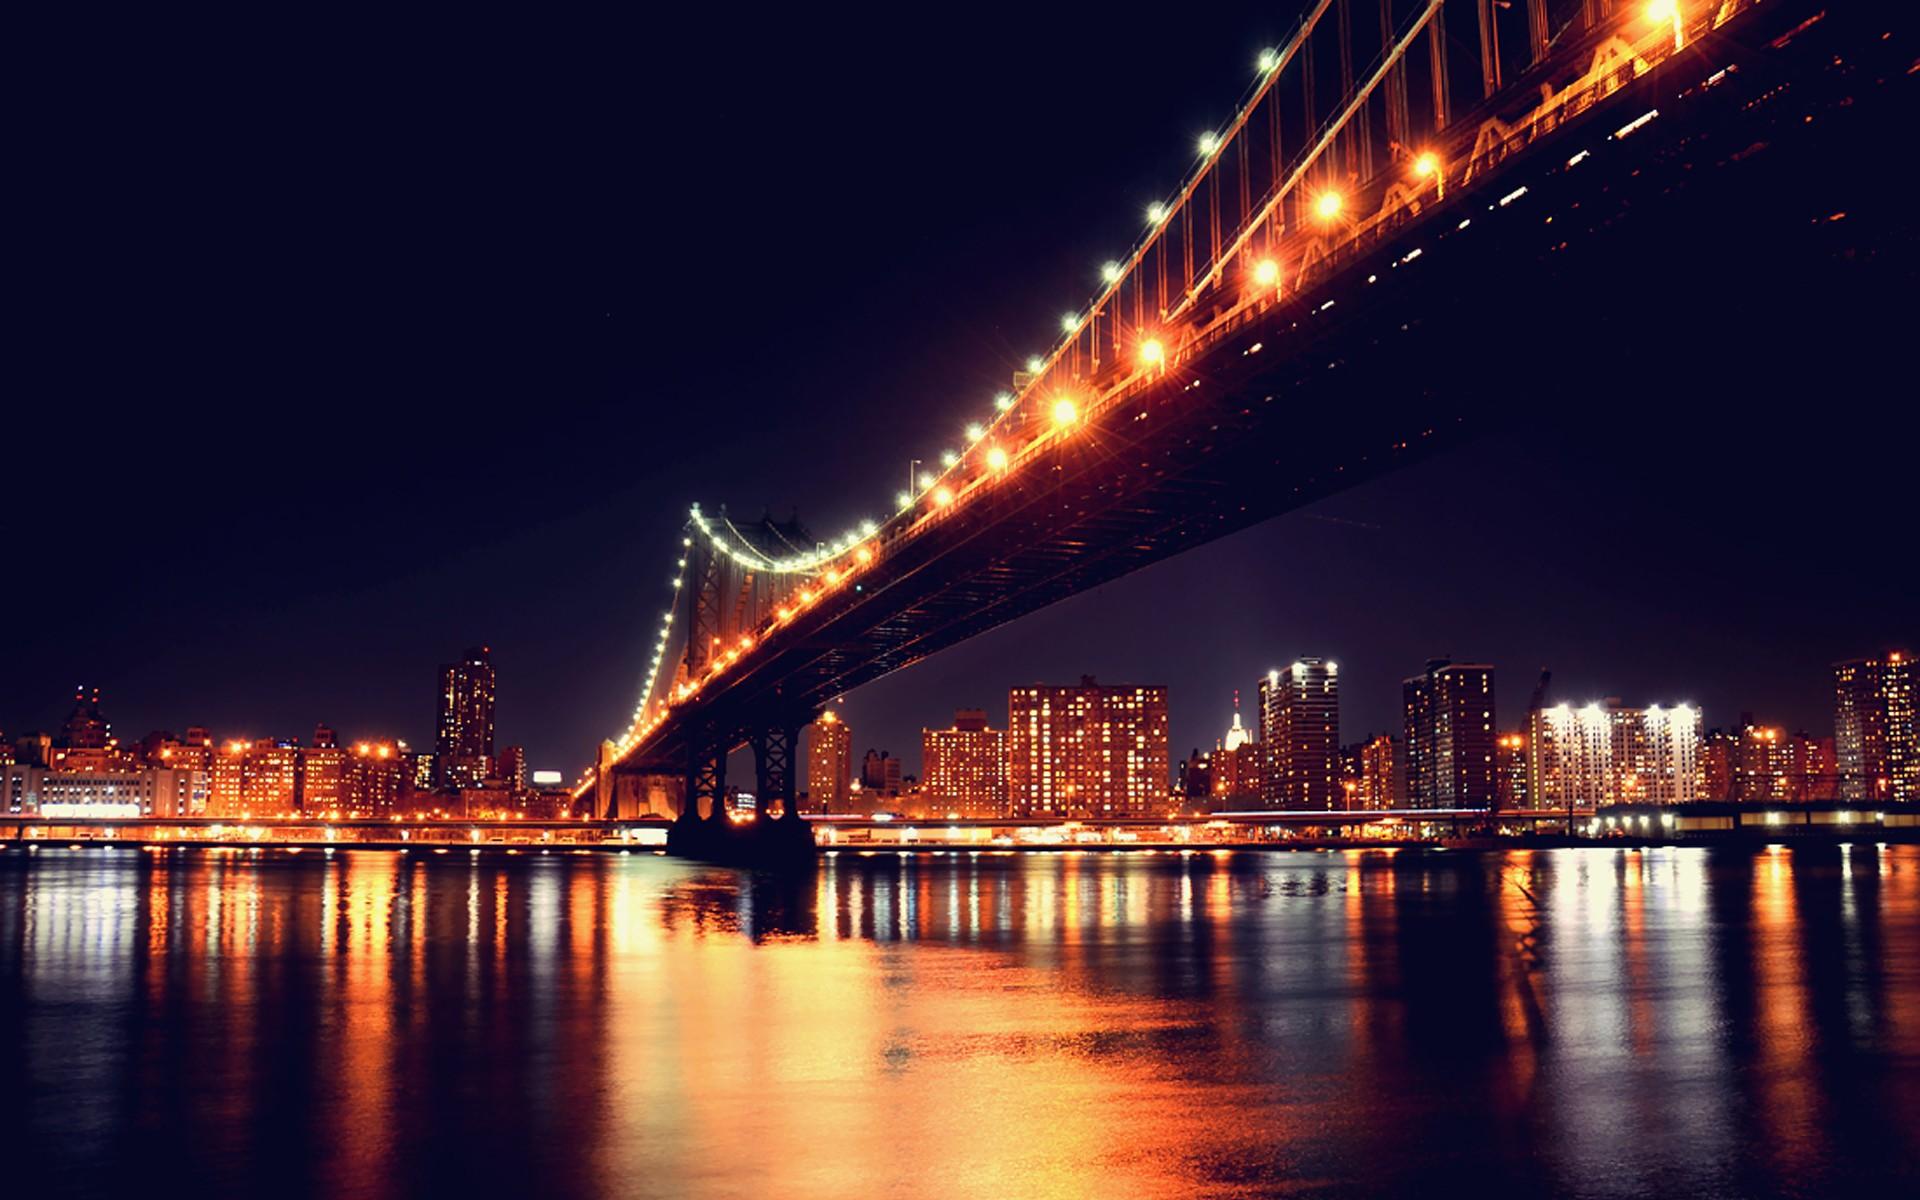 bridge architecture night - photo #14